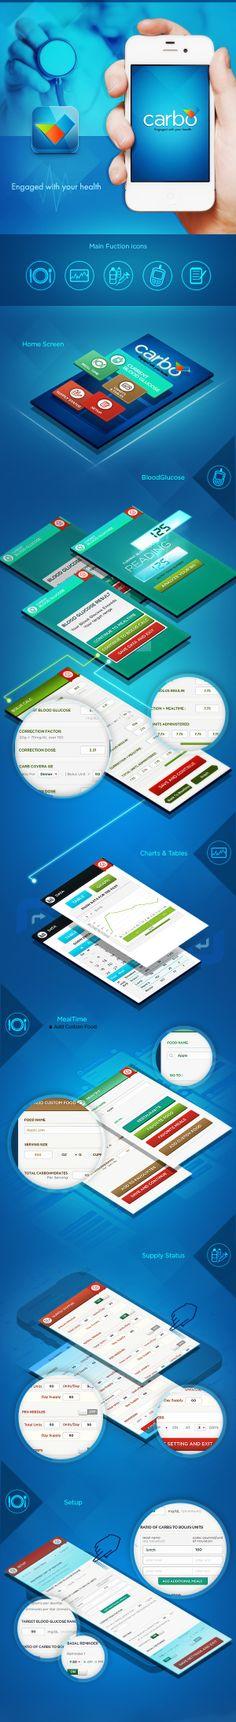 Carbo - (Medical App) by Shakeeb AK, via Behance